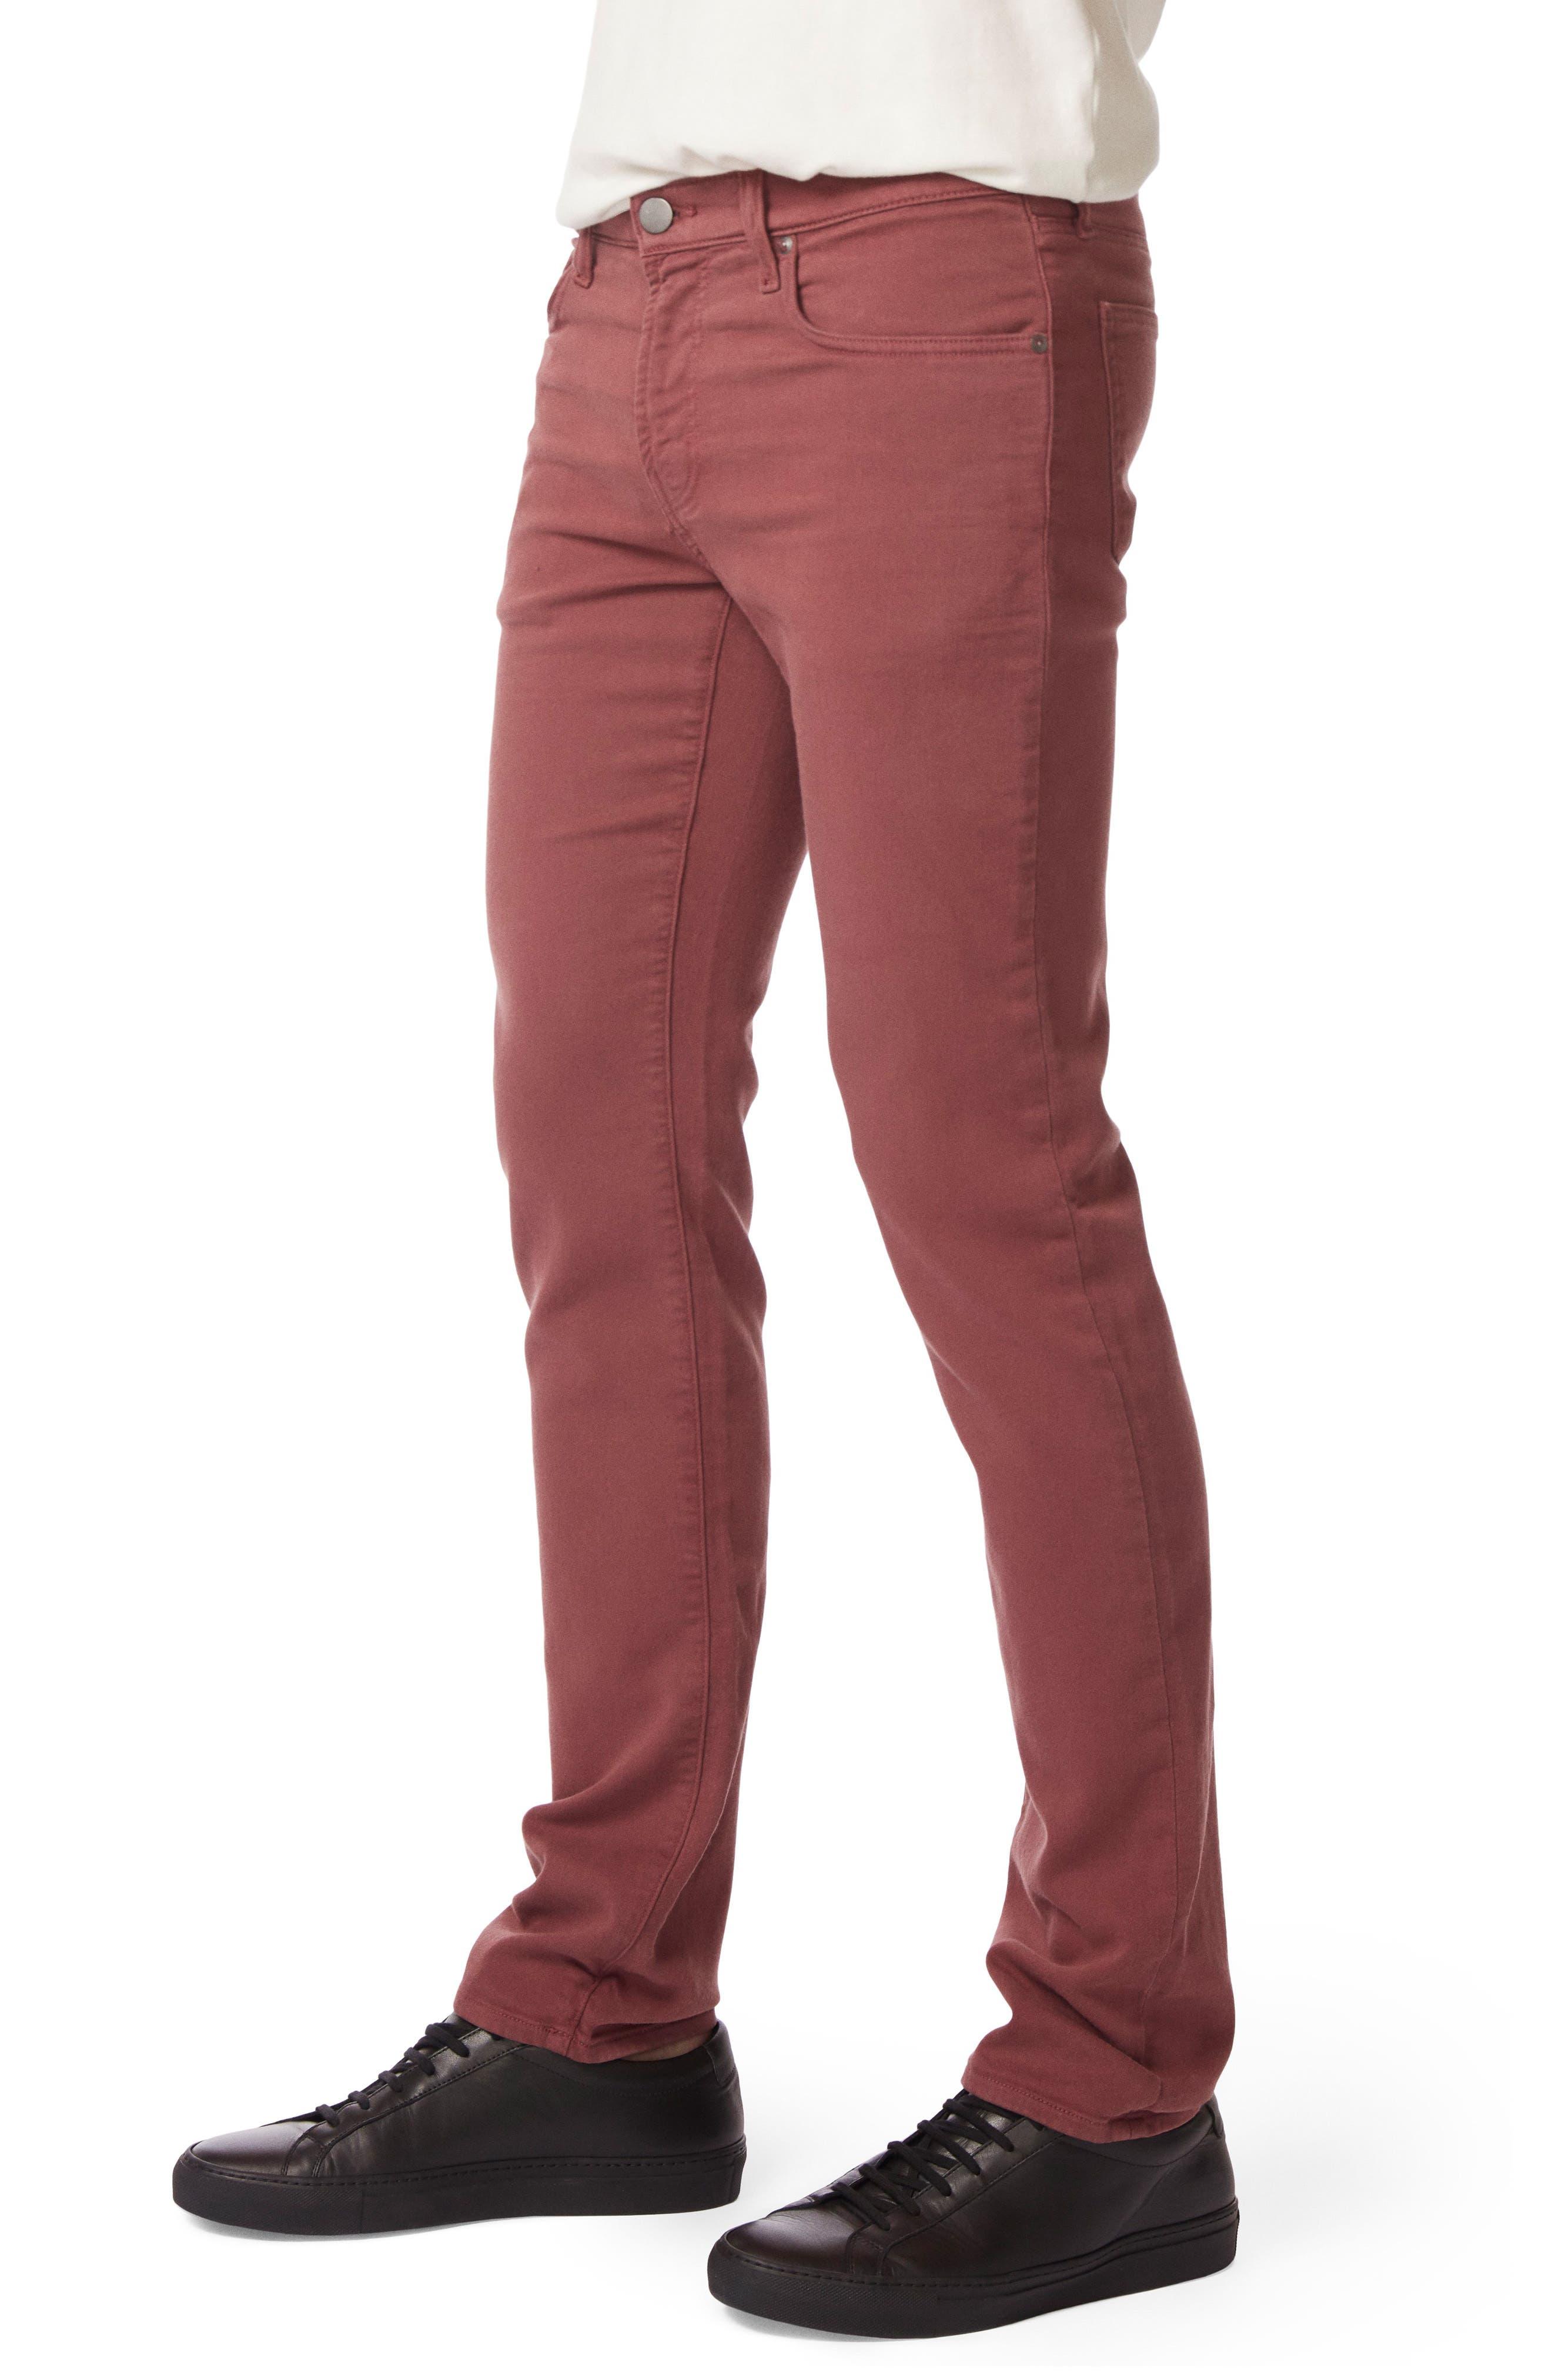 Kane Slim Straight Leg Pants,                             Alternate thumbnail 3, color,                             Keckley Basella